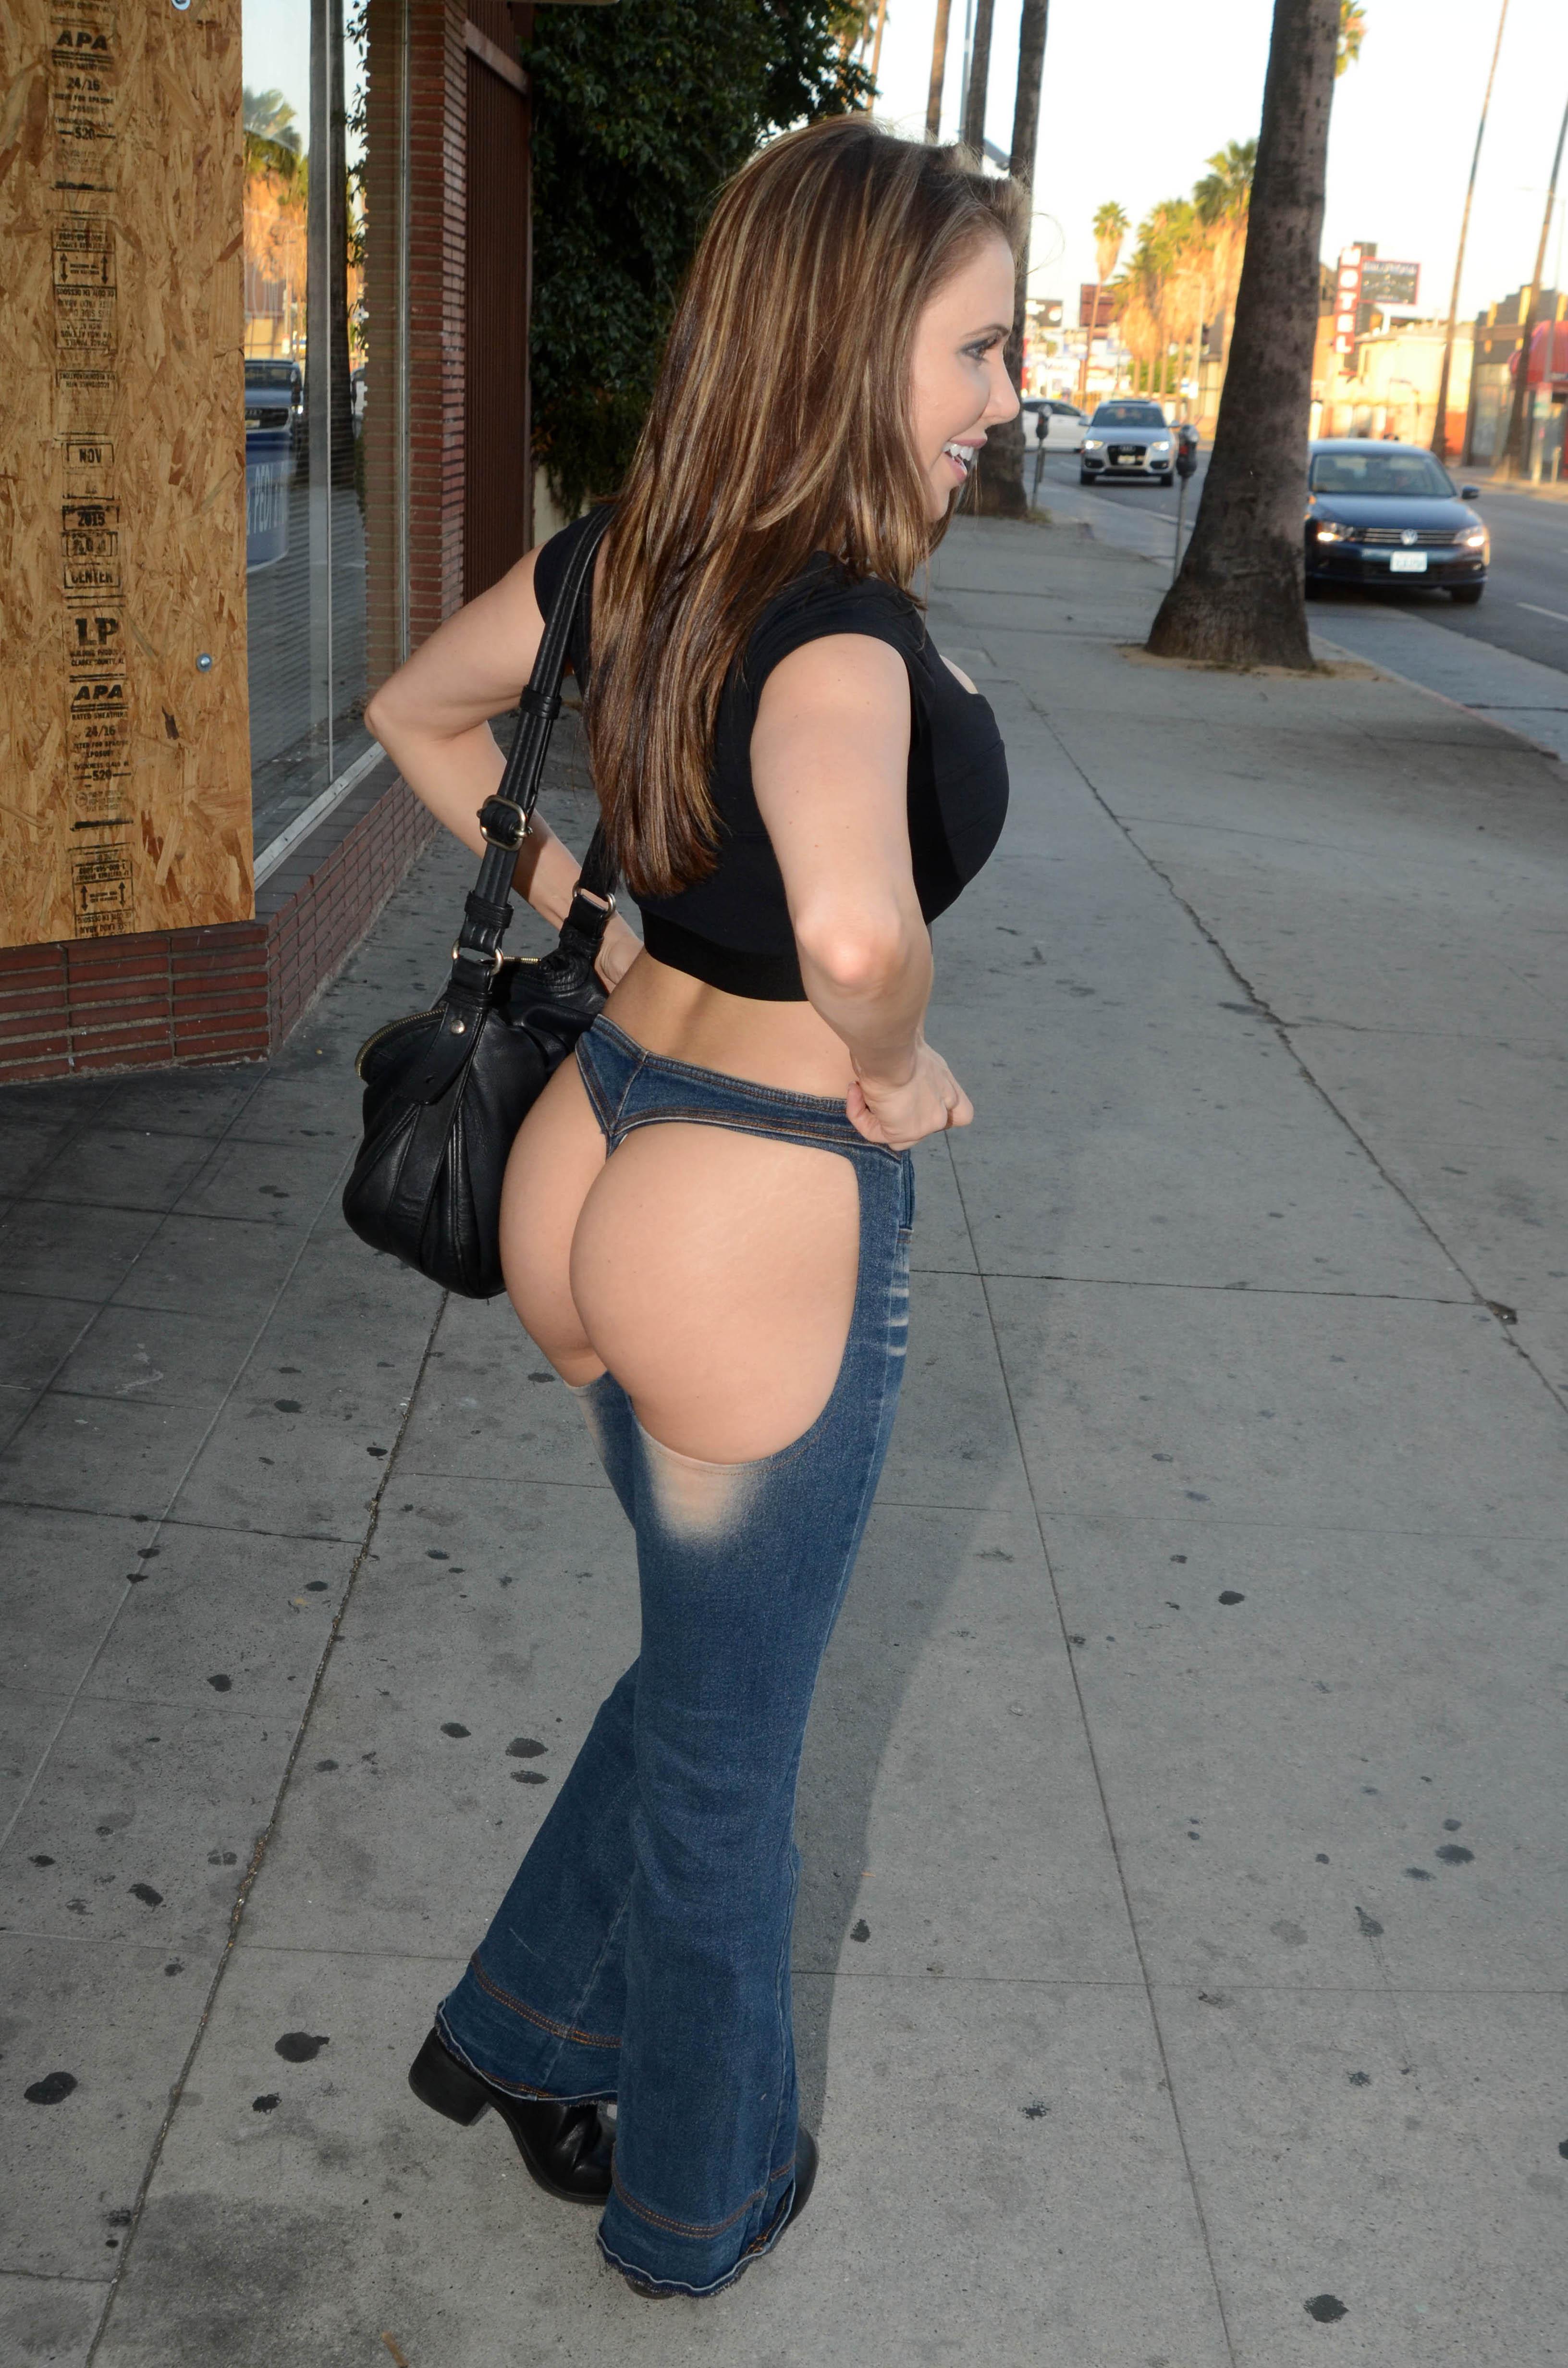 Booty Pics Of Erika Jorda...